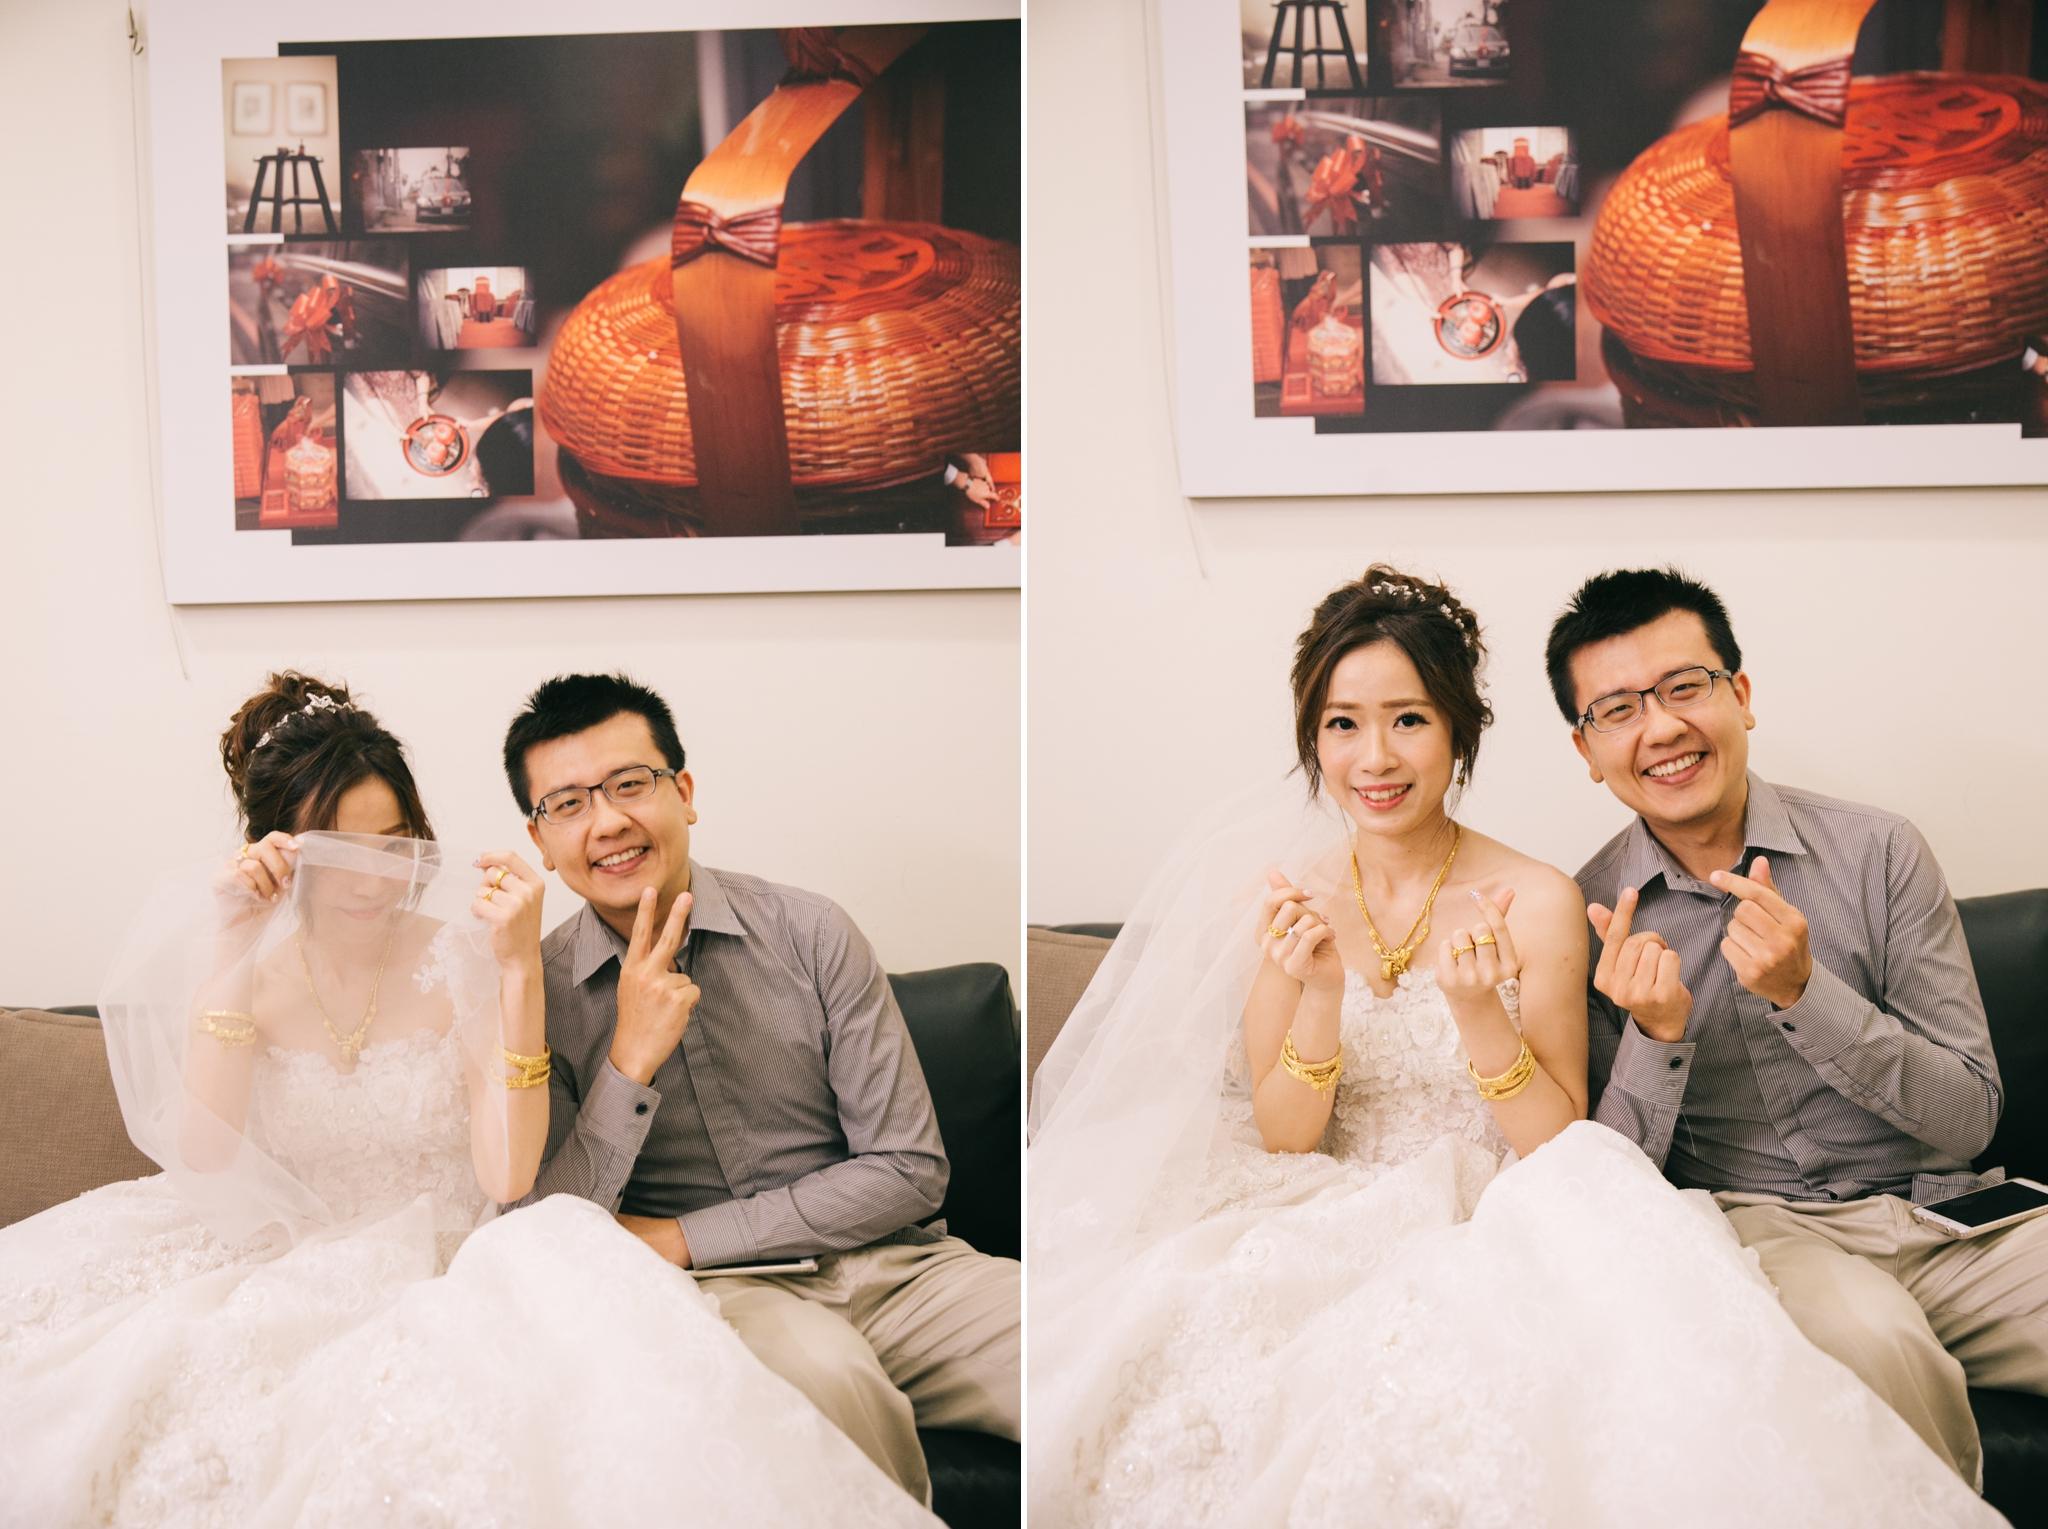 Tina+Nash-wedding-台北婚禮迎娶晚宴-新莊終身大事-112.jpg